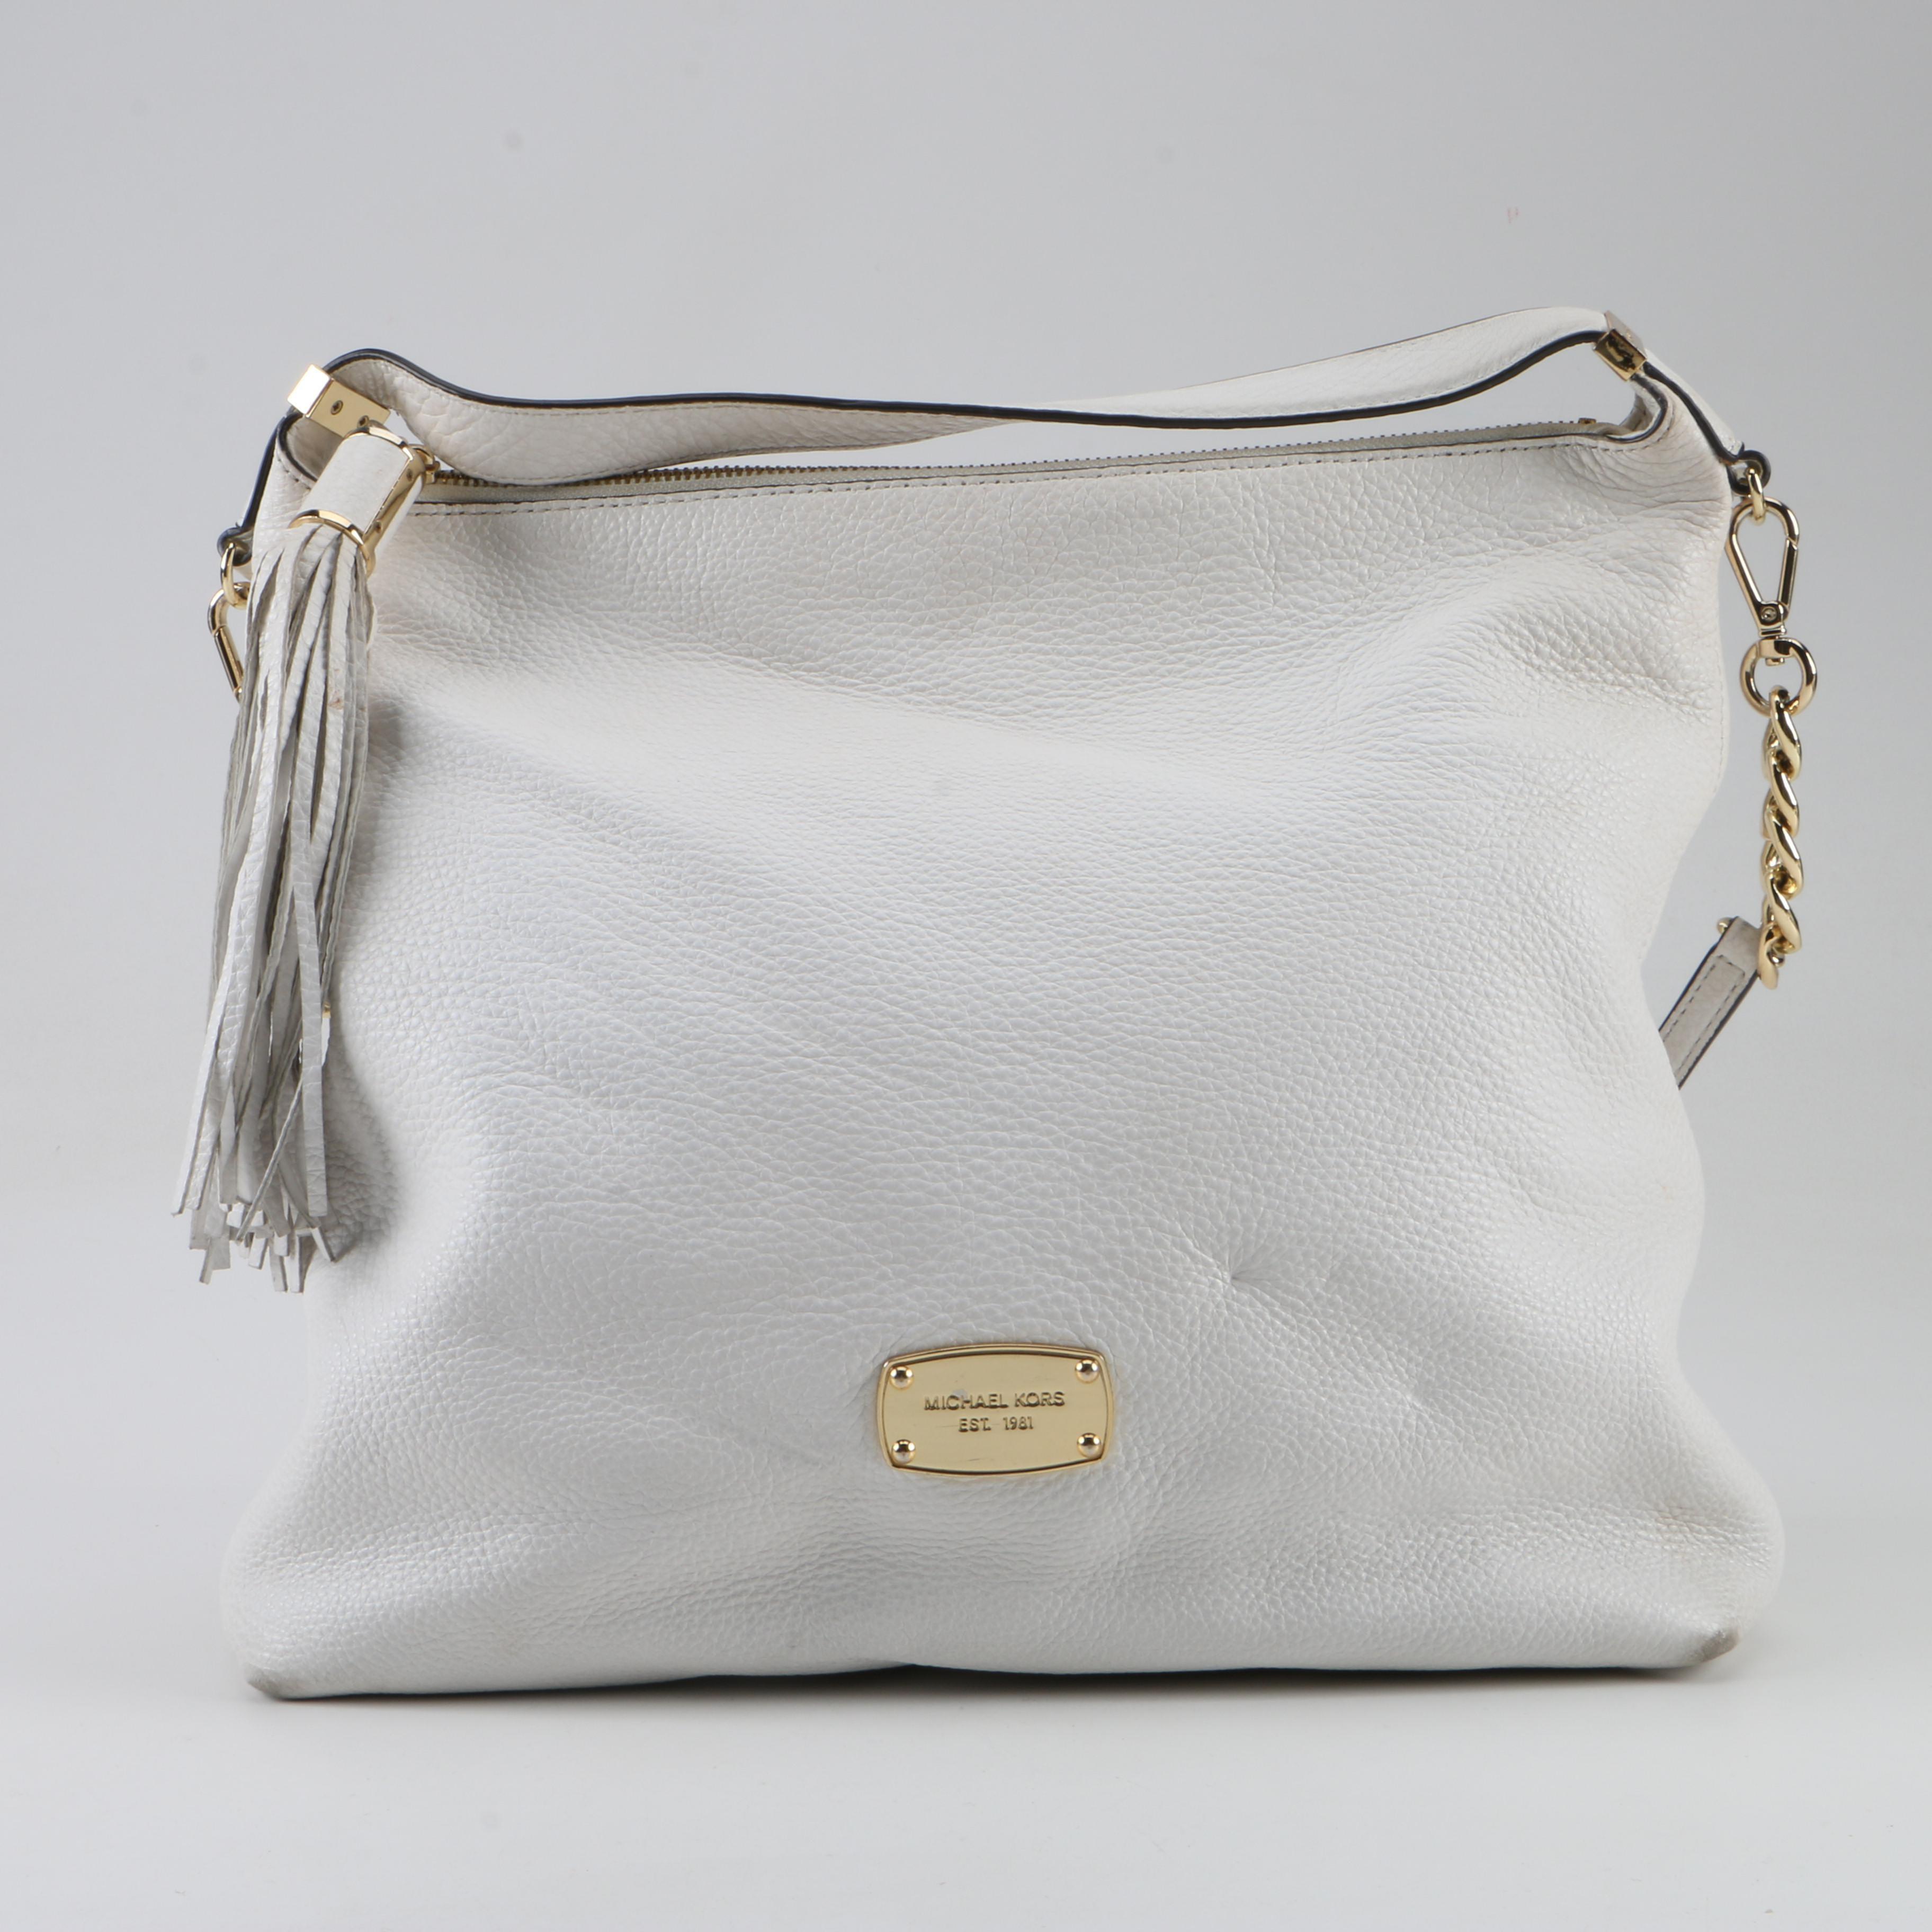 MICHAEL Michael Kors White Pebbled Leather Satchel